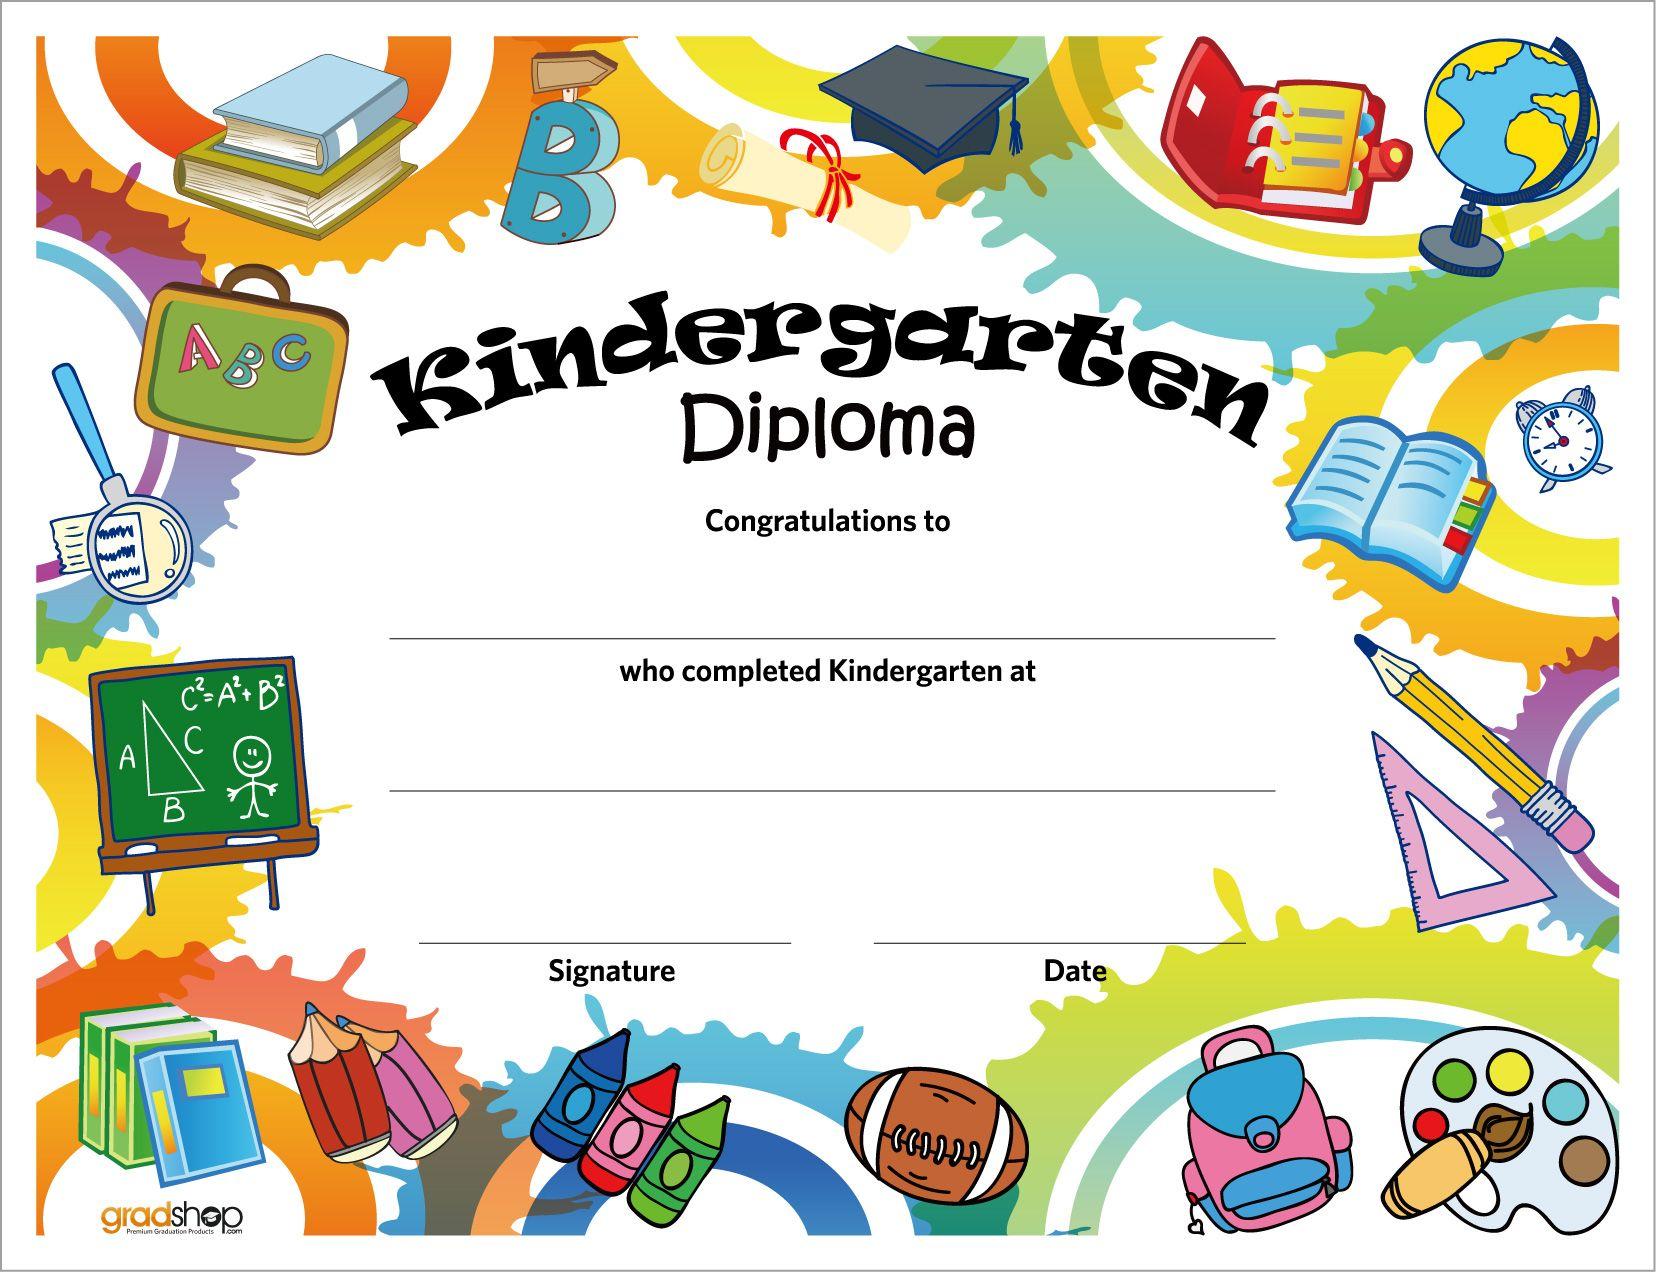 marcos y bordes escolares - Buscar con Google   diploma   Pinterest ...